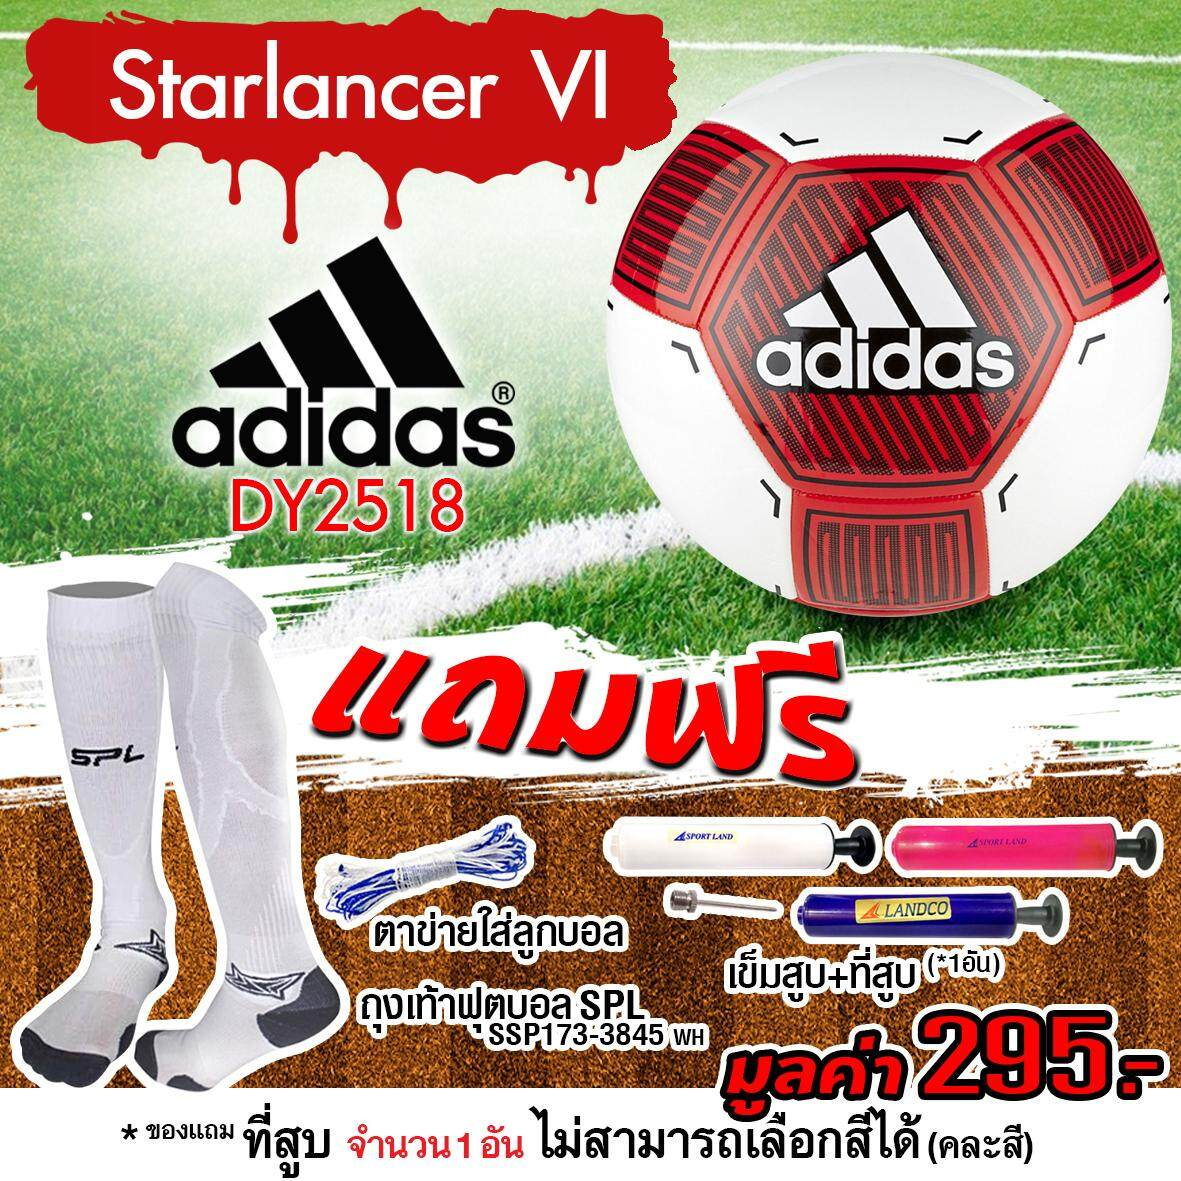 Adidas ฟุตบอลหนัง อาดิดาส Football Starlancer VI DY2518(500) แถมฟรี ตาข่ายใส่ลูกฟุตบอล + เข็มสูบสูบลม + สูบมือ SPL รุ่น SL6 + ถุงเท้าฟุตบอล Striker 17.3 WH